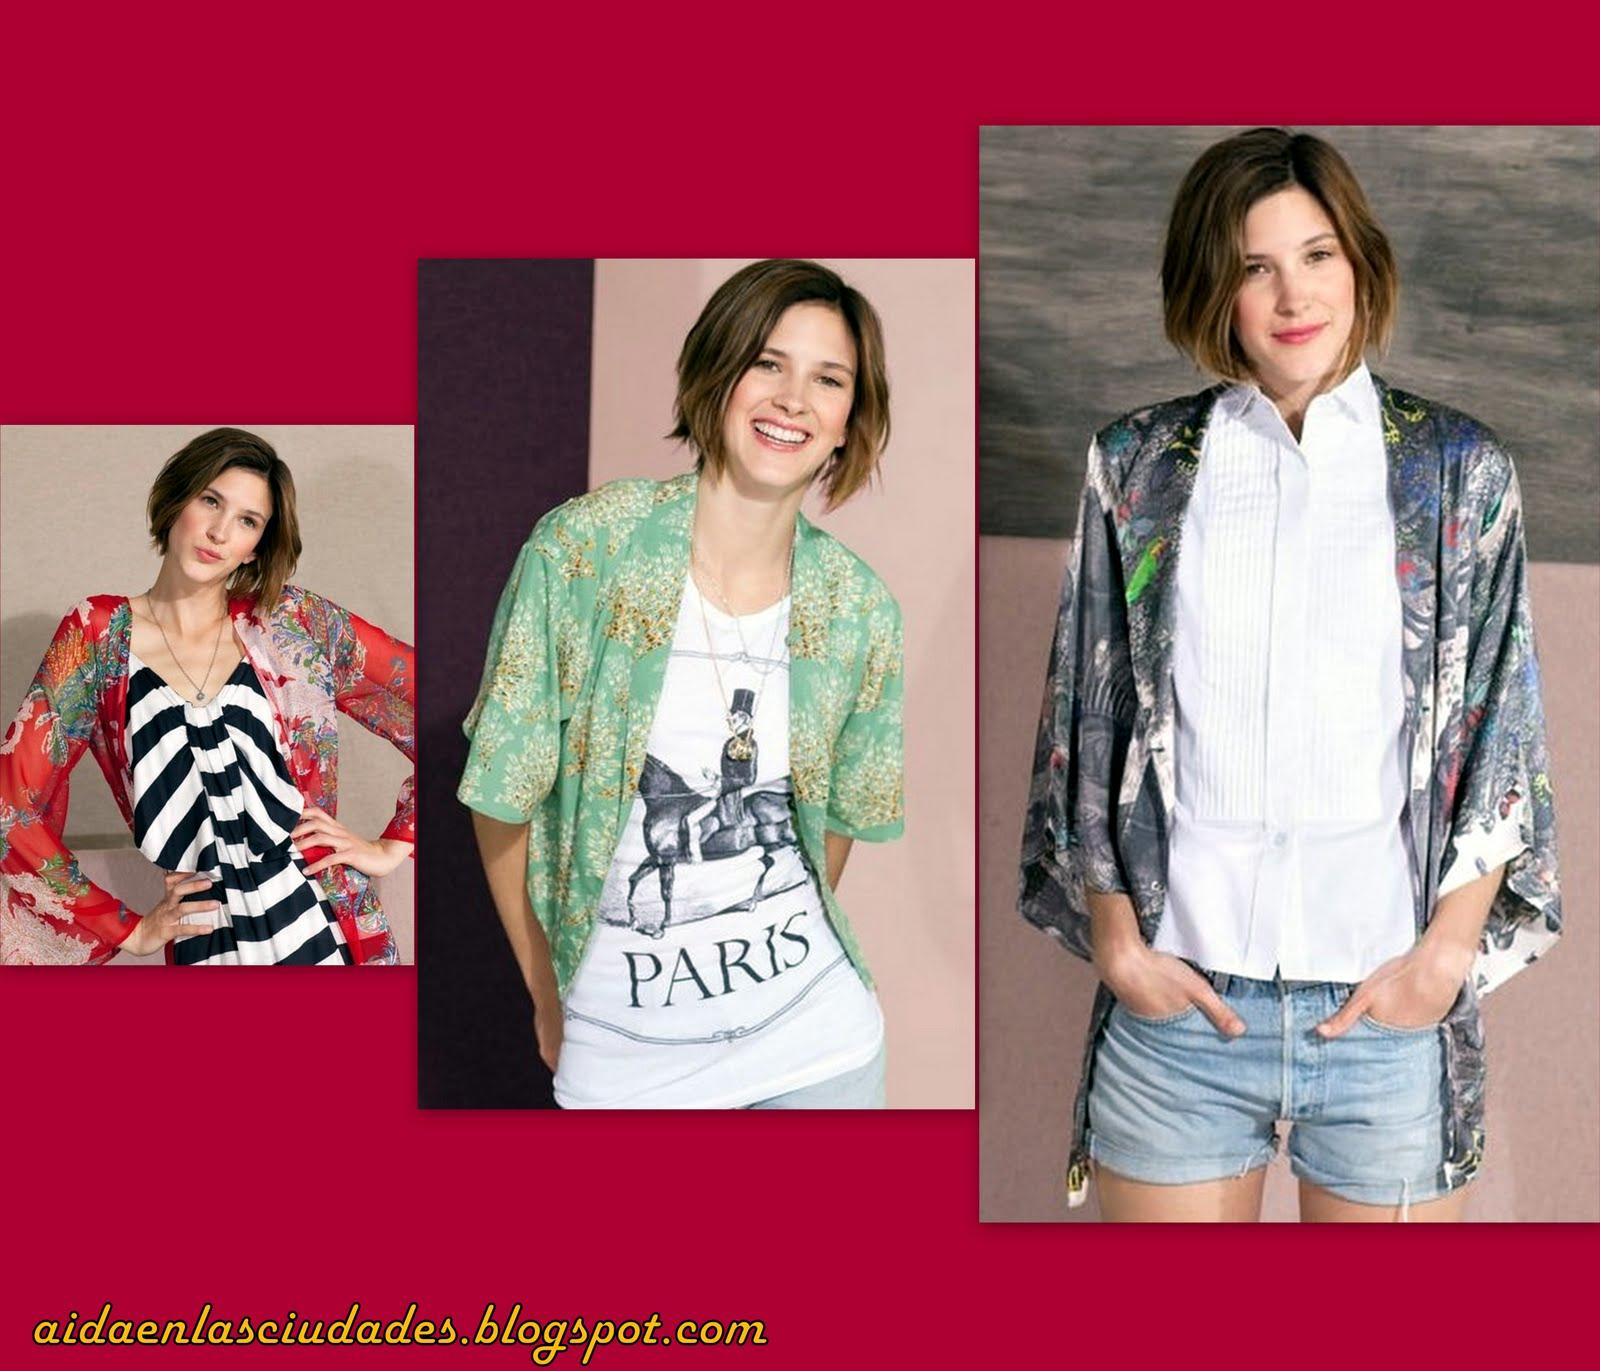 http://2.bp.blogspot.com/-0eAhhY23dno/Te5s2JJ92OI/AAAAAAAAASw/euJanwGxMDU/s1600/Collages%2Bkimono%2B4.jpg